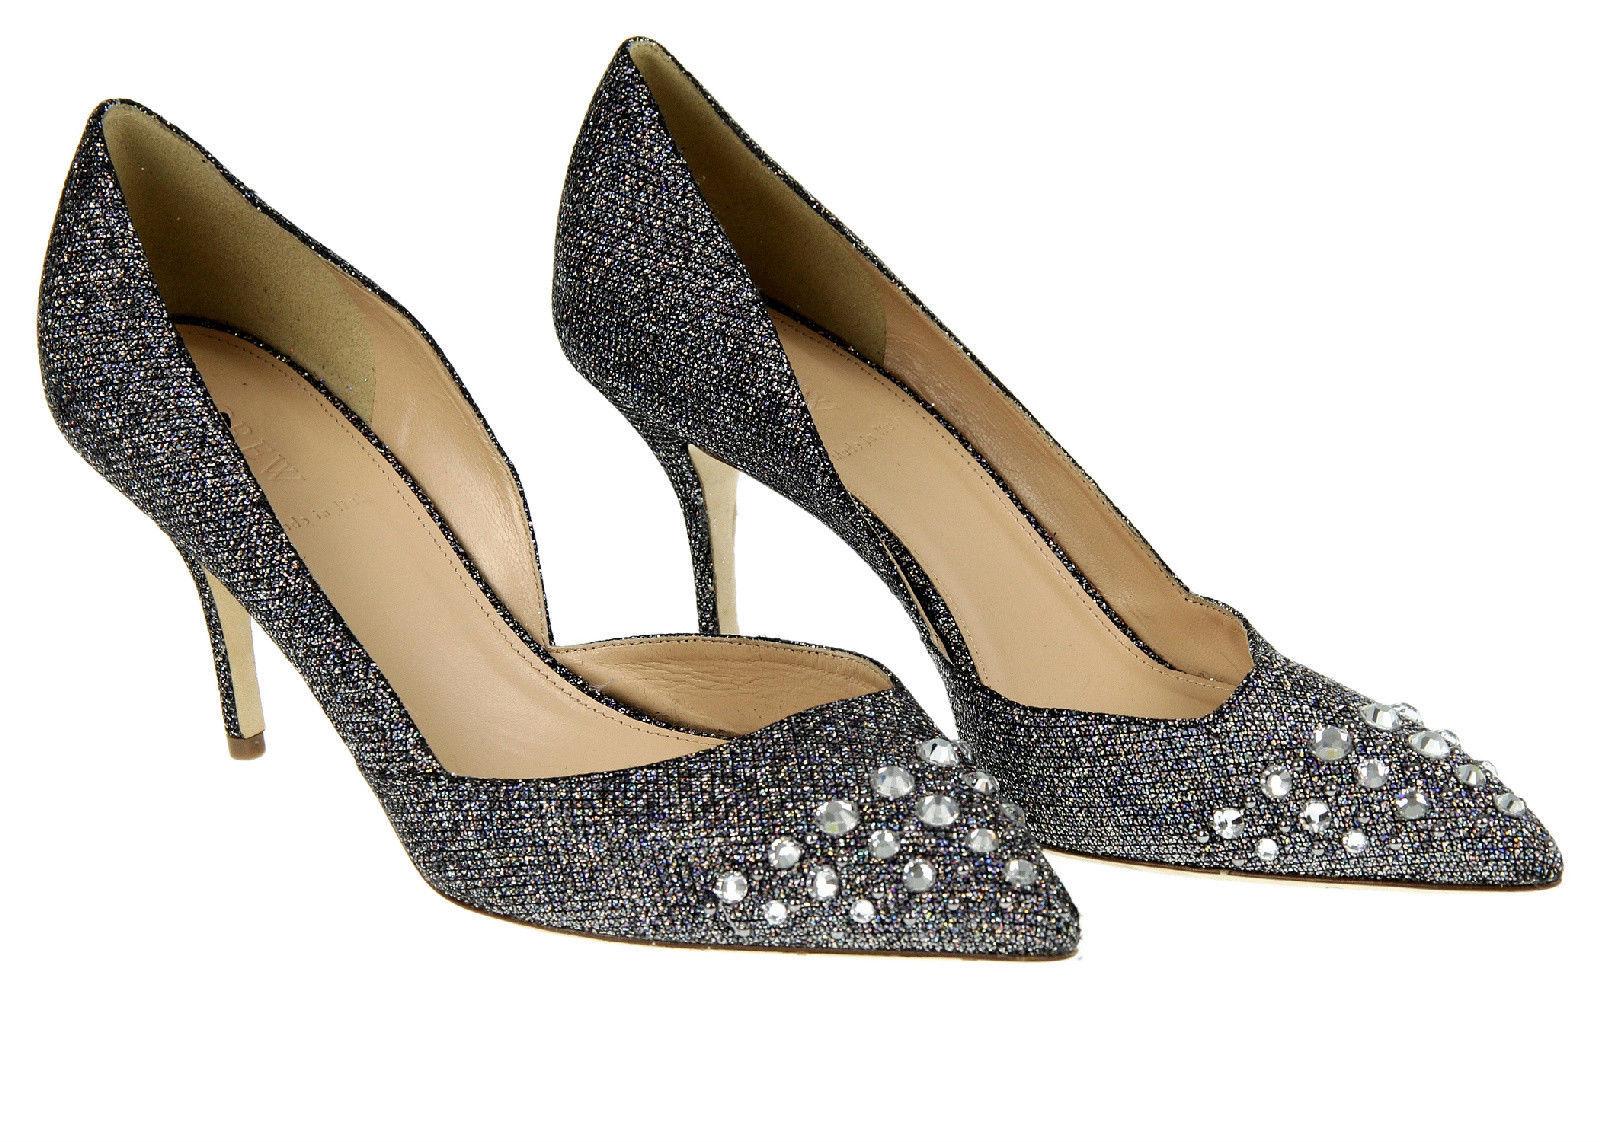 0be432bd5c8 S l1600. S l1600. Previous. J Crew Collection Colette Jeweled Glitter Pumps  9.5 E4601 Womens Shoes Heels